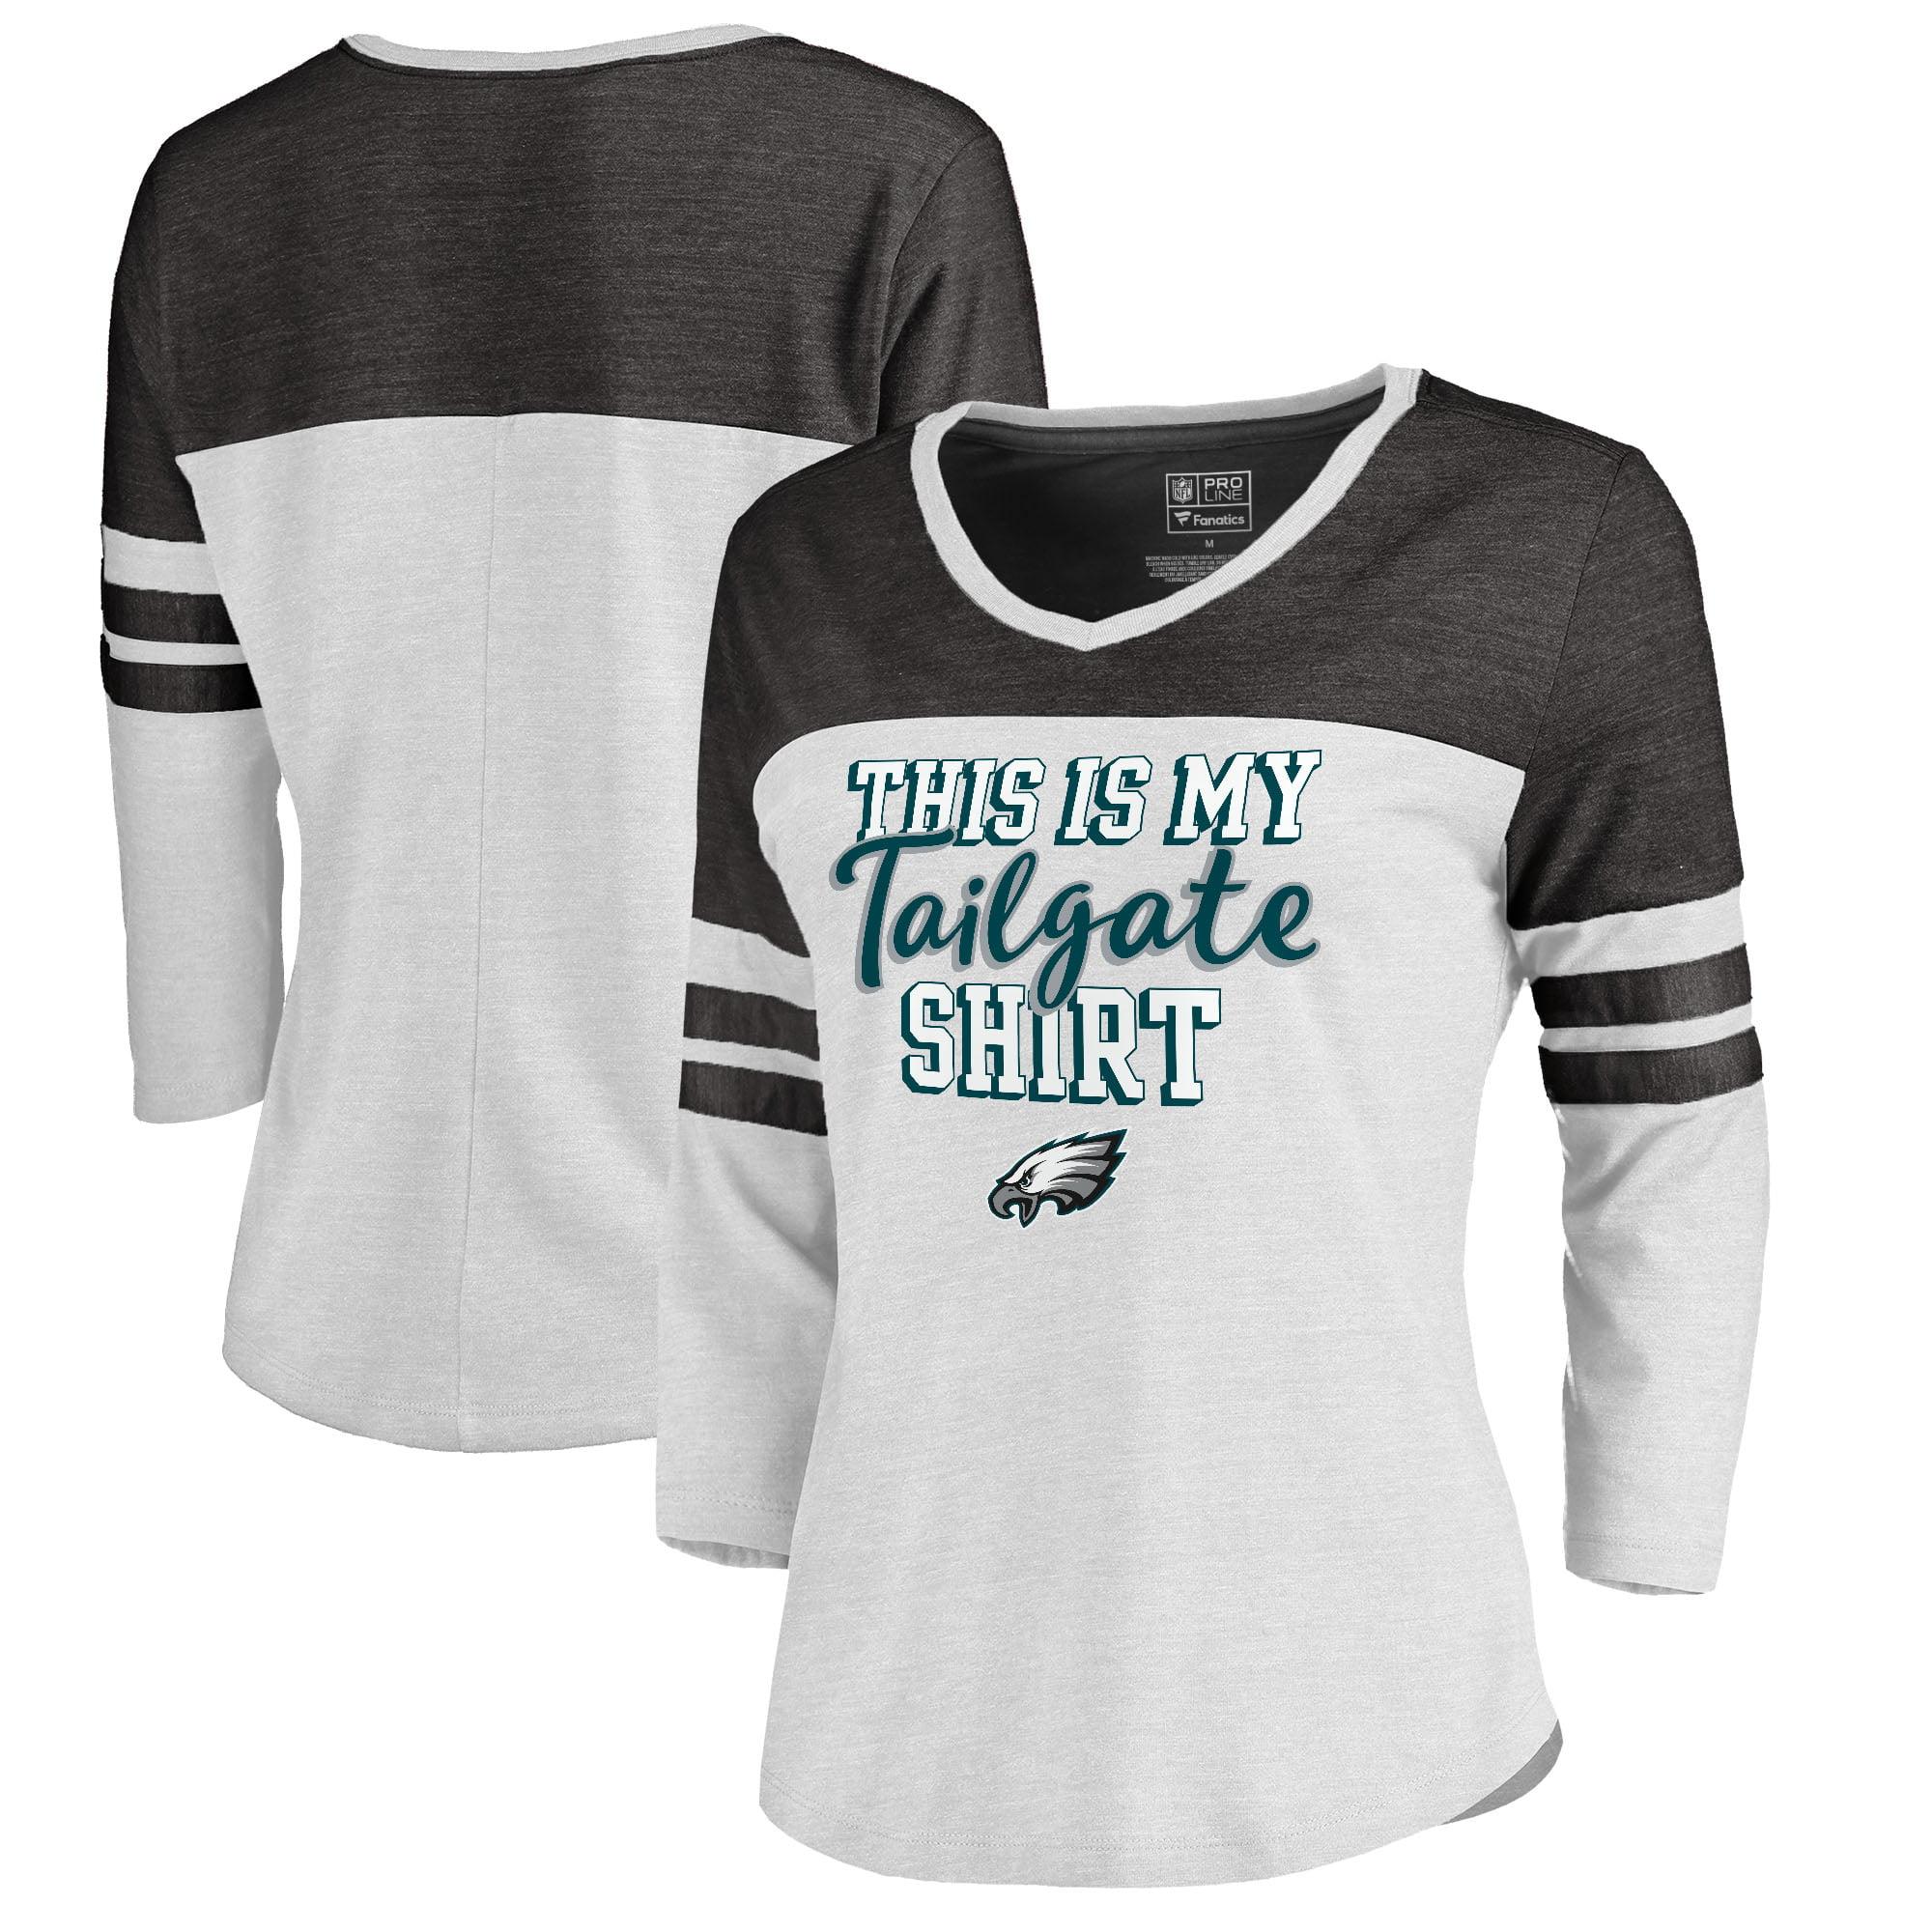 Philadelphia Eagles NFL Pro Line by Fanatics Branded Women's Plus Size Air Color Block Tri-Blend 3/4-Sleeve T-Shirt - White